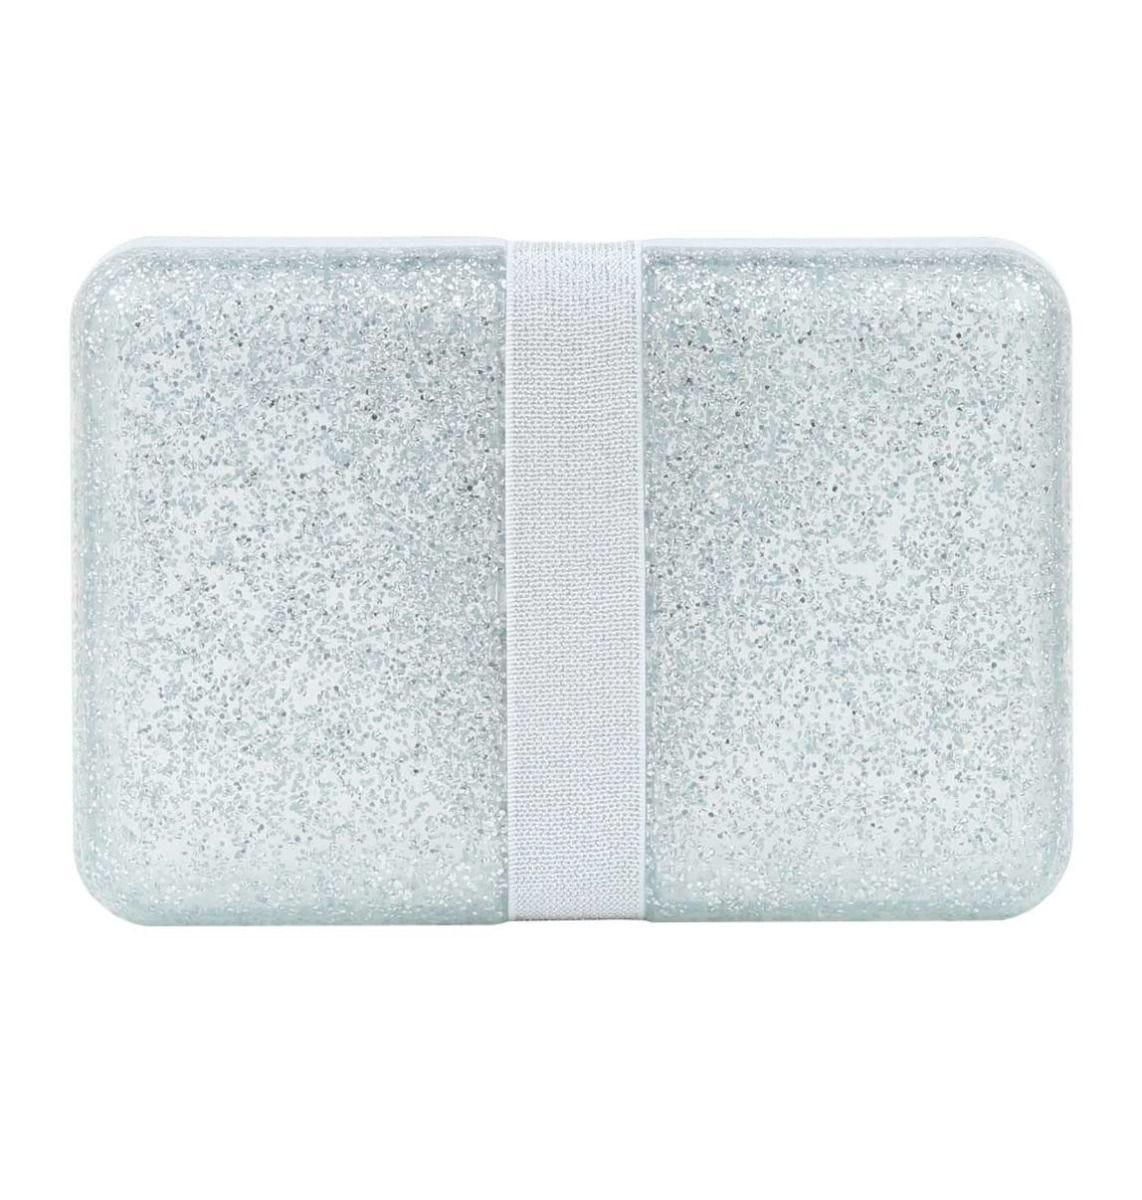 A Little Lovely Company - Lunch box: Glitter - silver